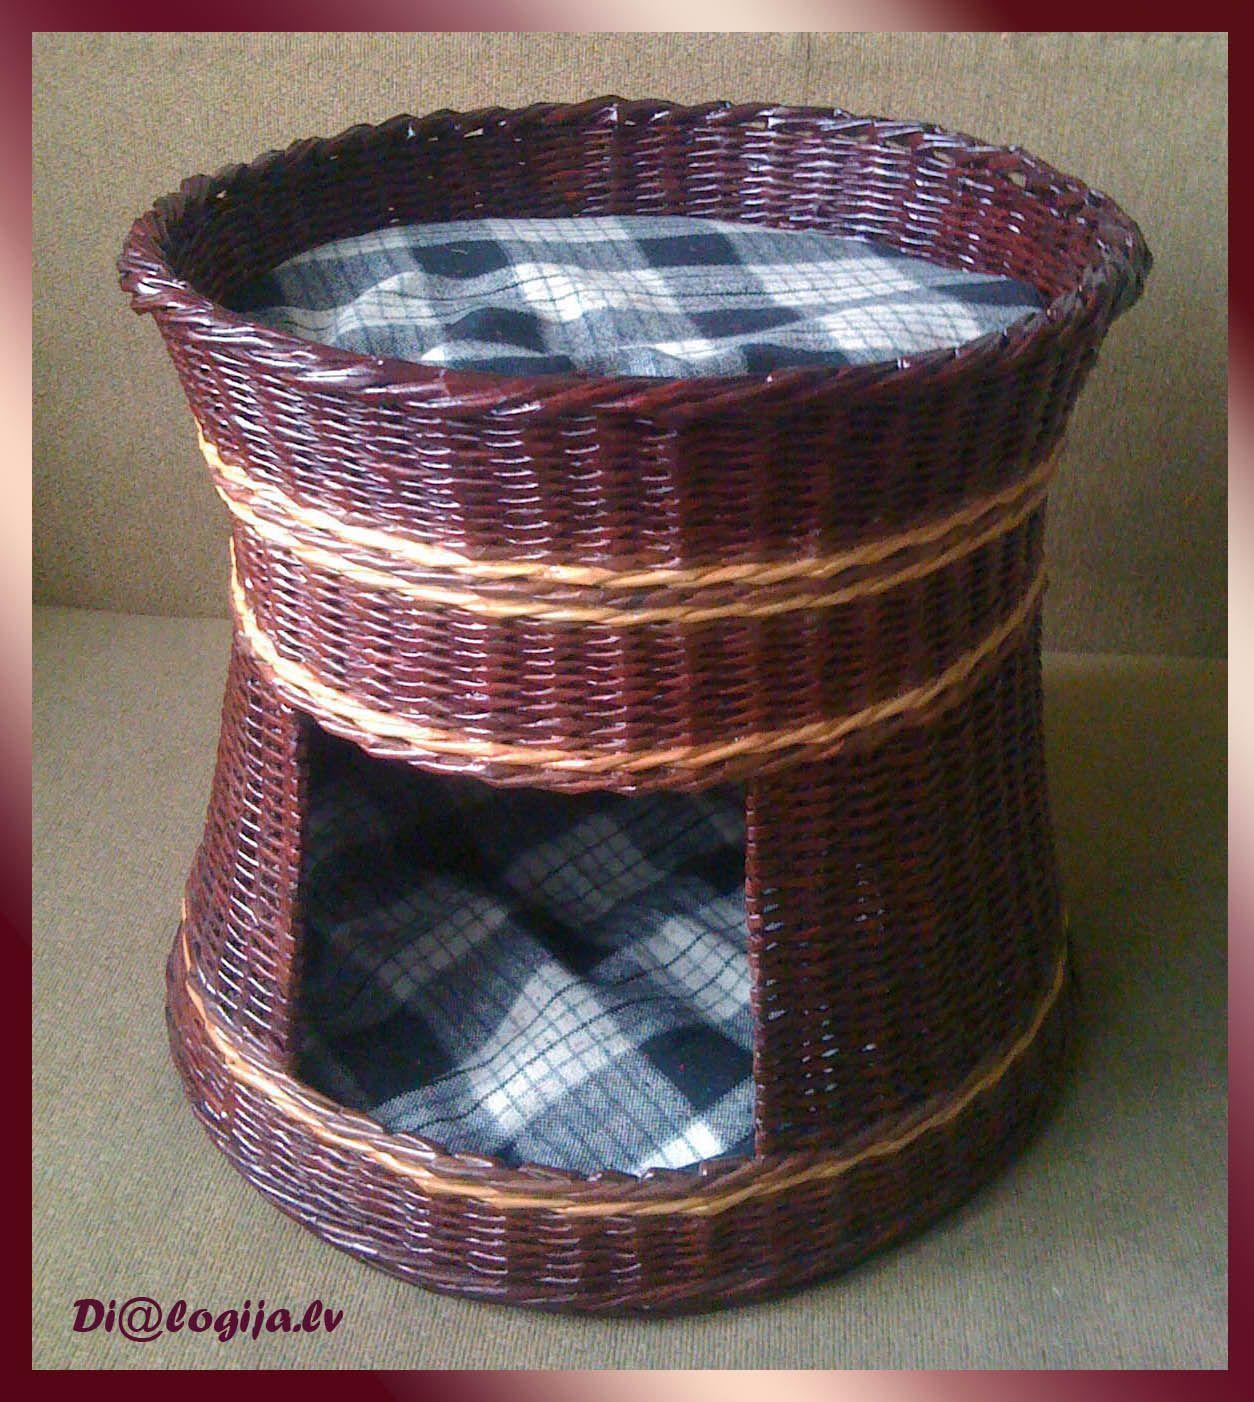 cat house dialogija basketry and wicker pinterest korbflechten und flechten. Black Bedroom Furniture Sets. Home Design Ideas